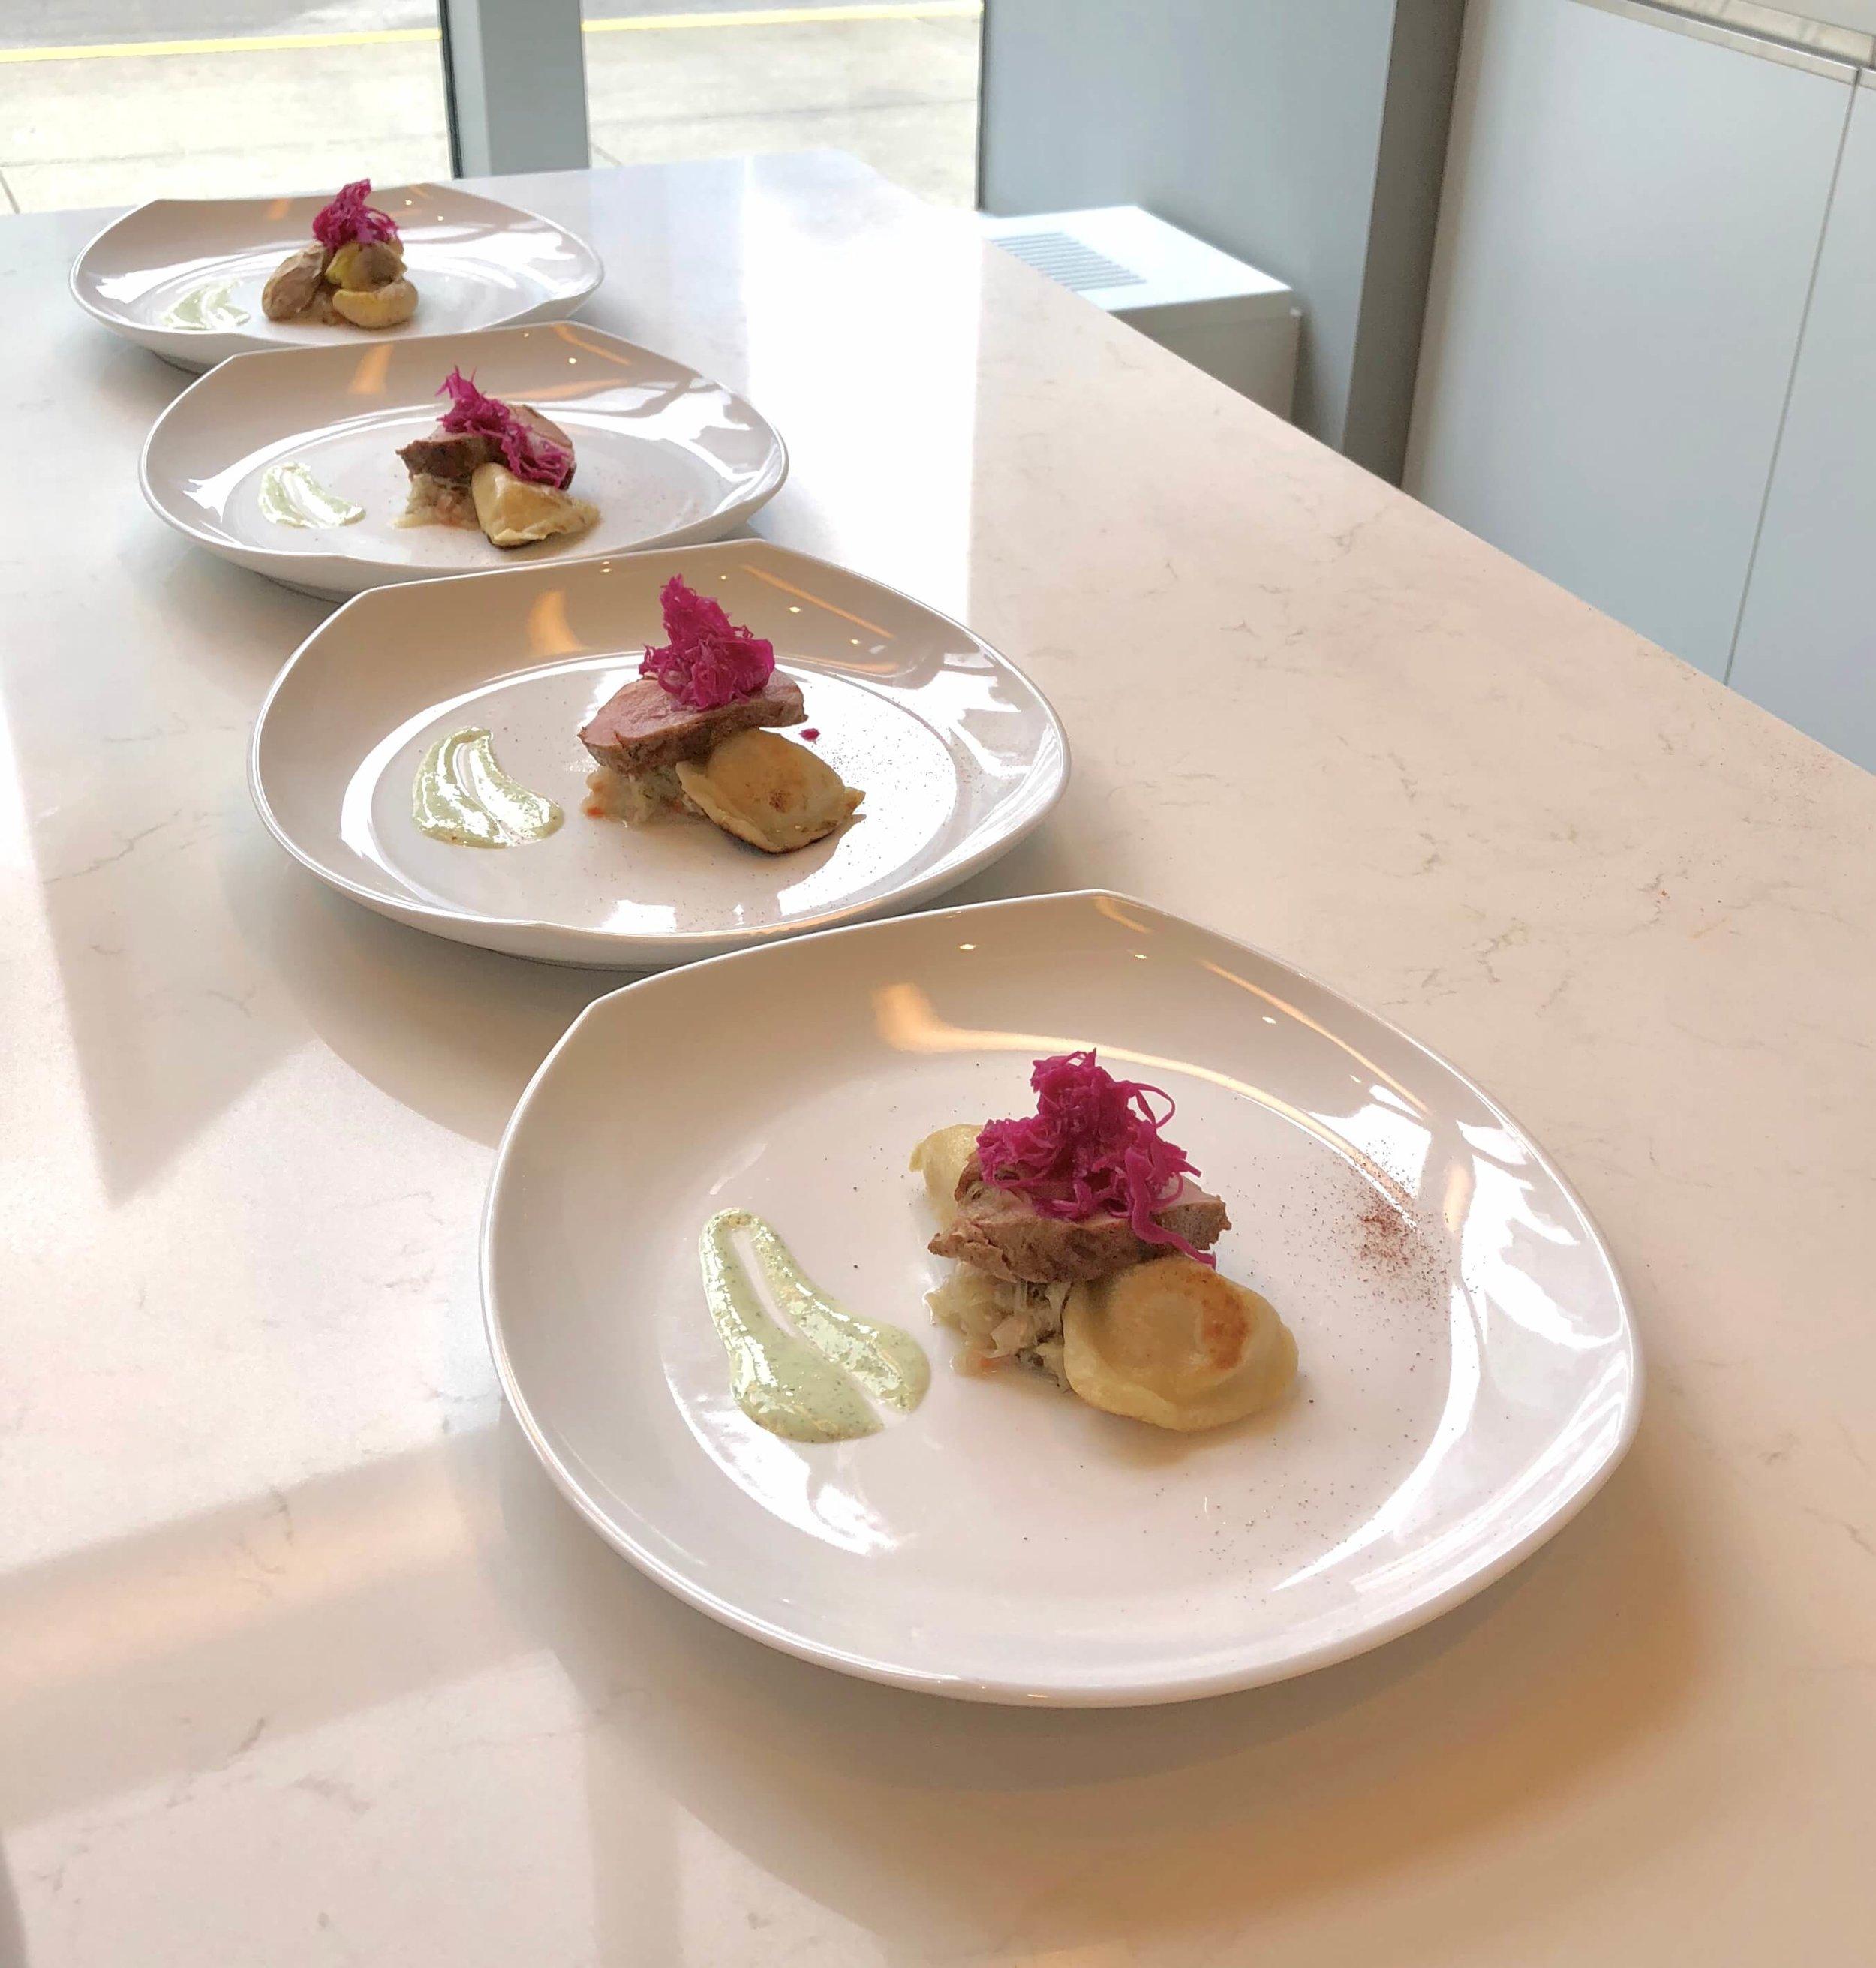 Cooking with a chef at Monogram Appliances showroom #porktenderloin #monogramappliances